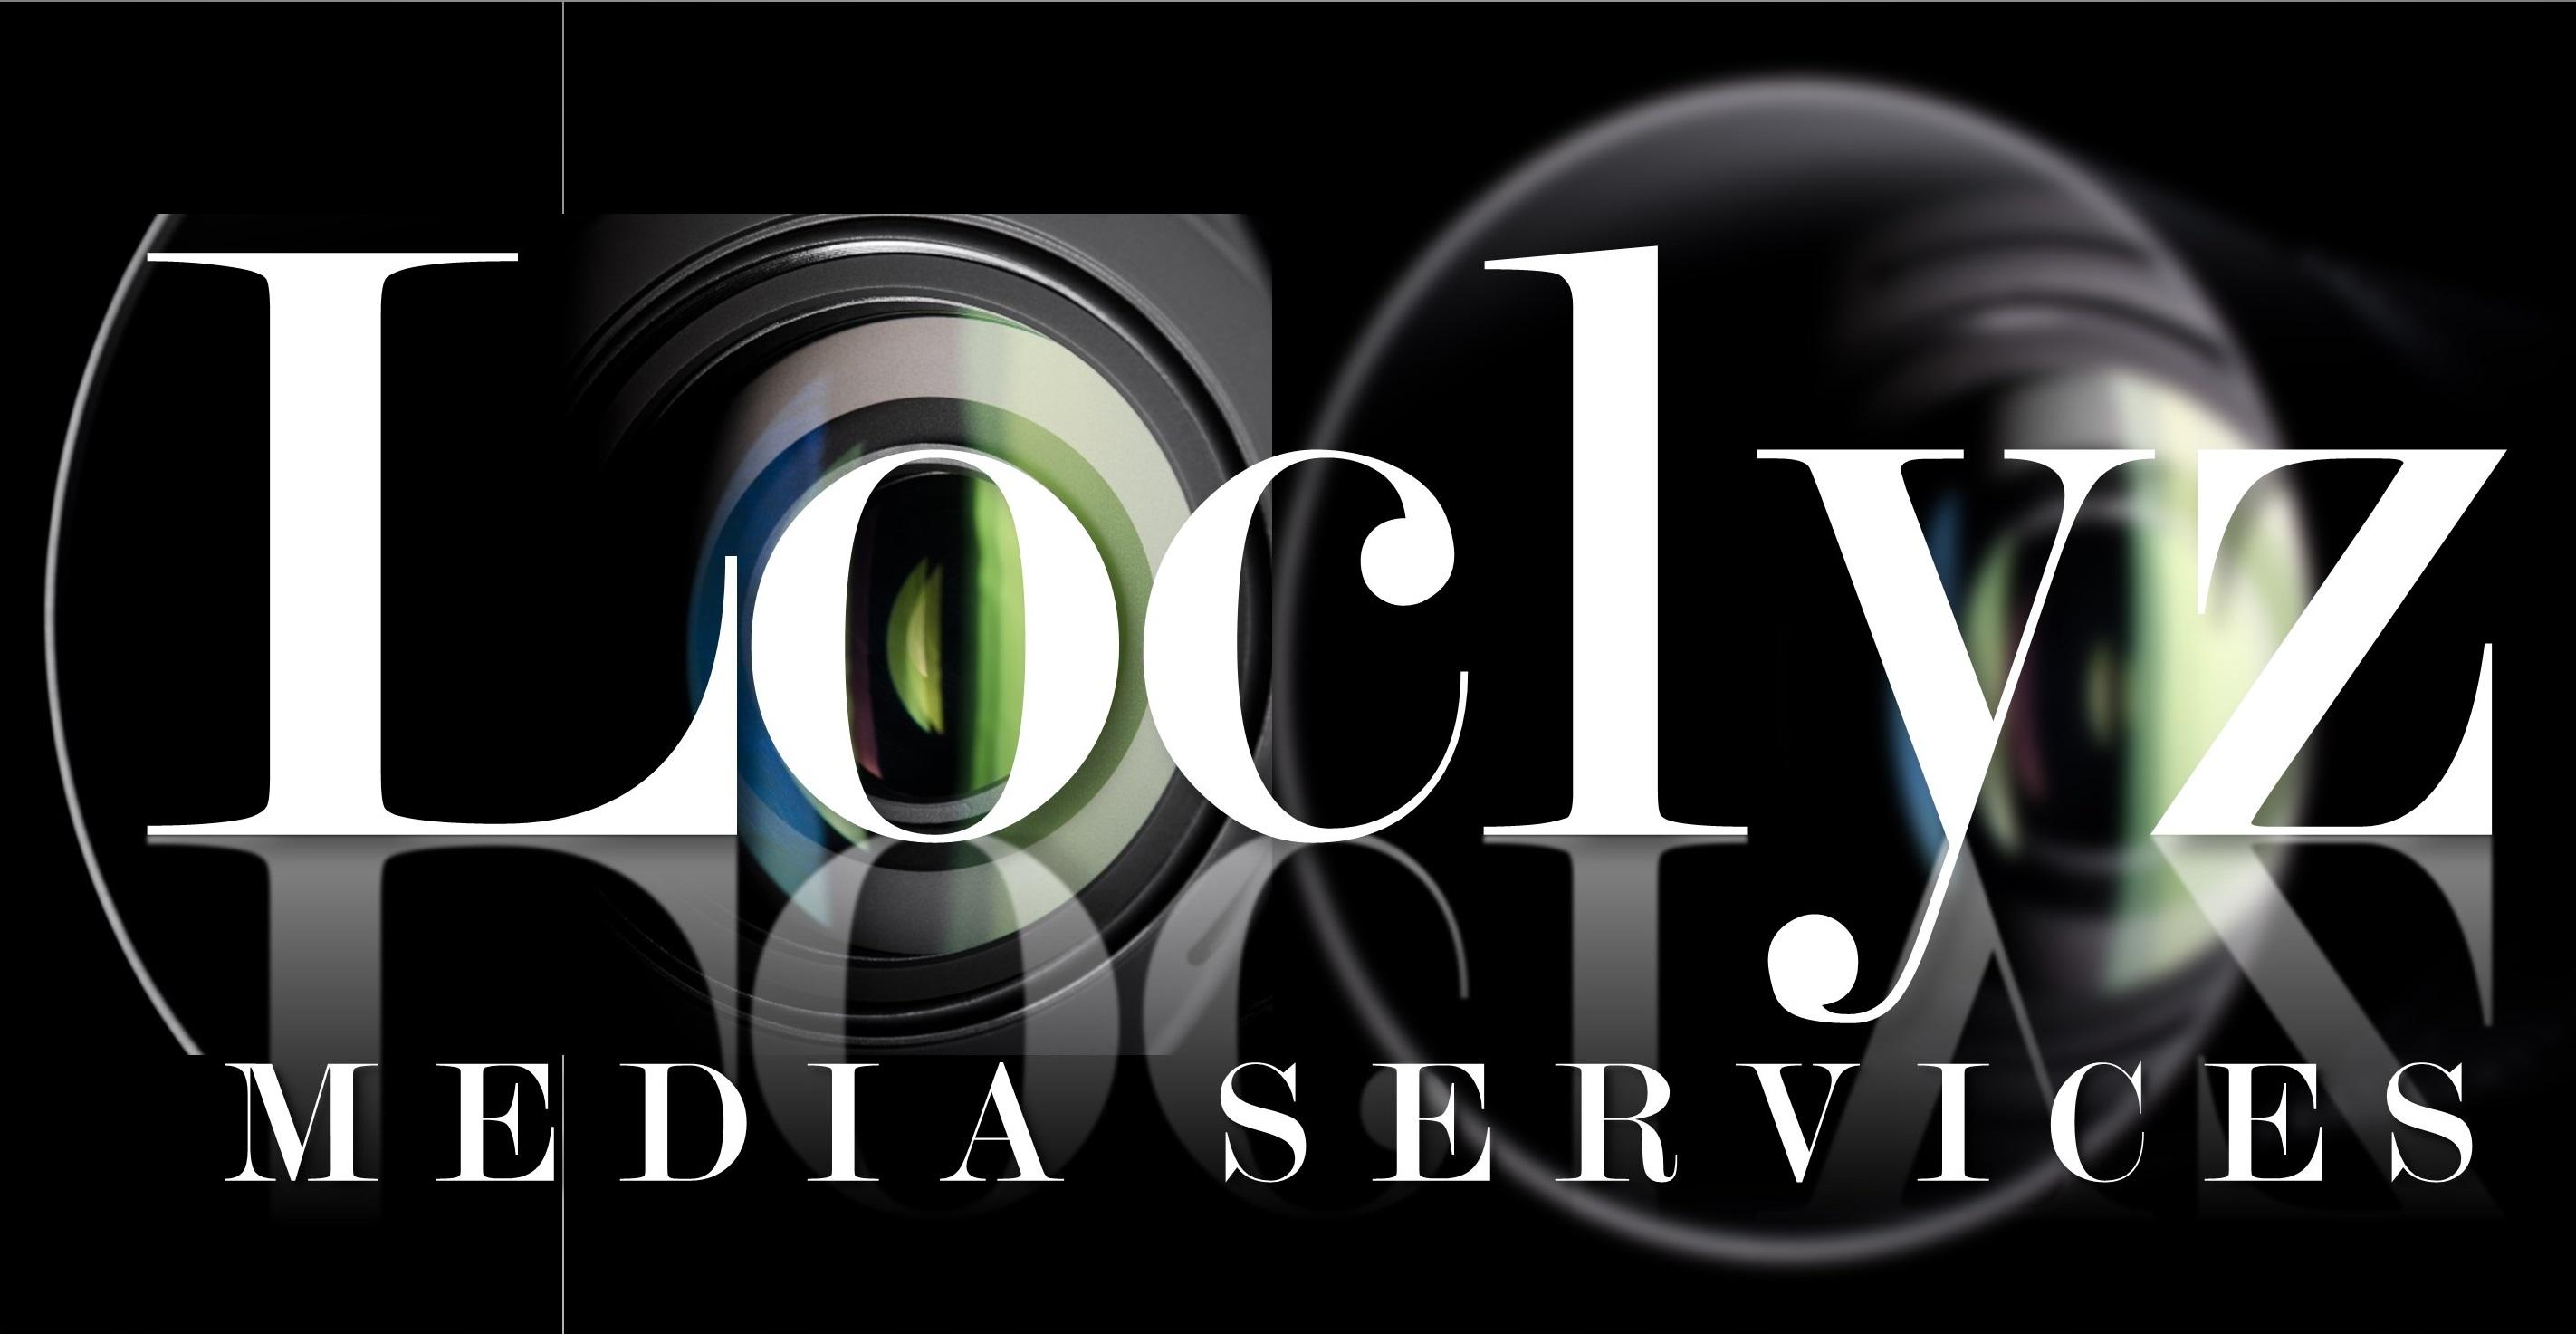 LOCLYZ Media